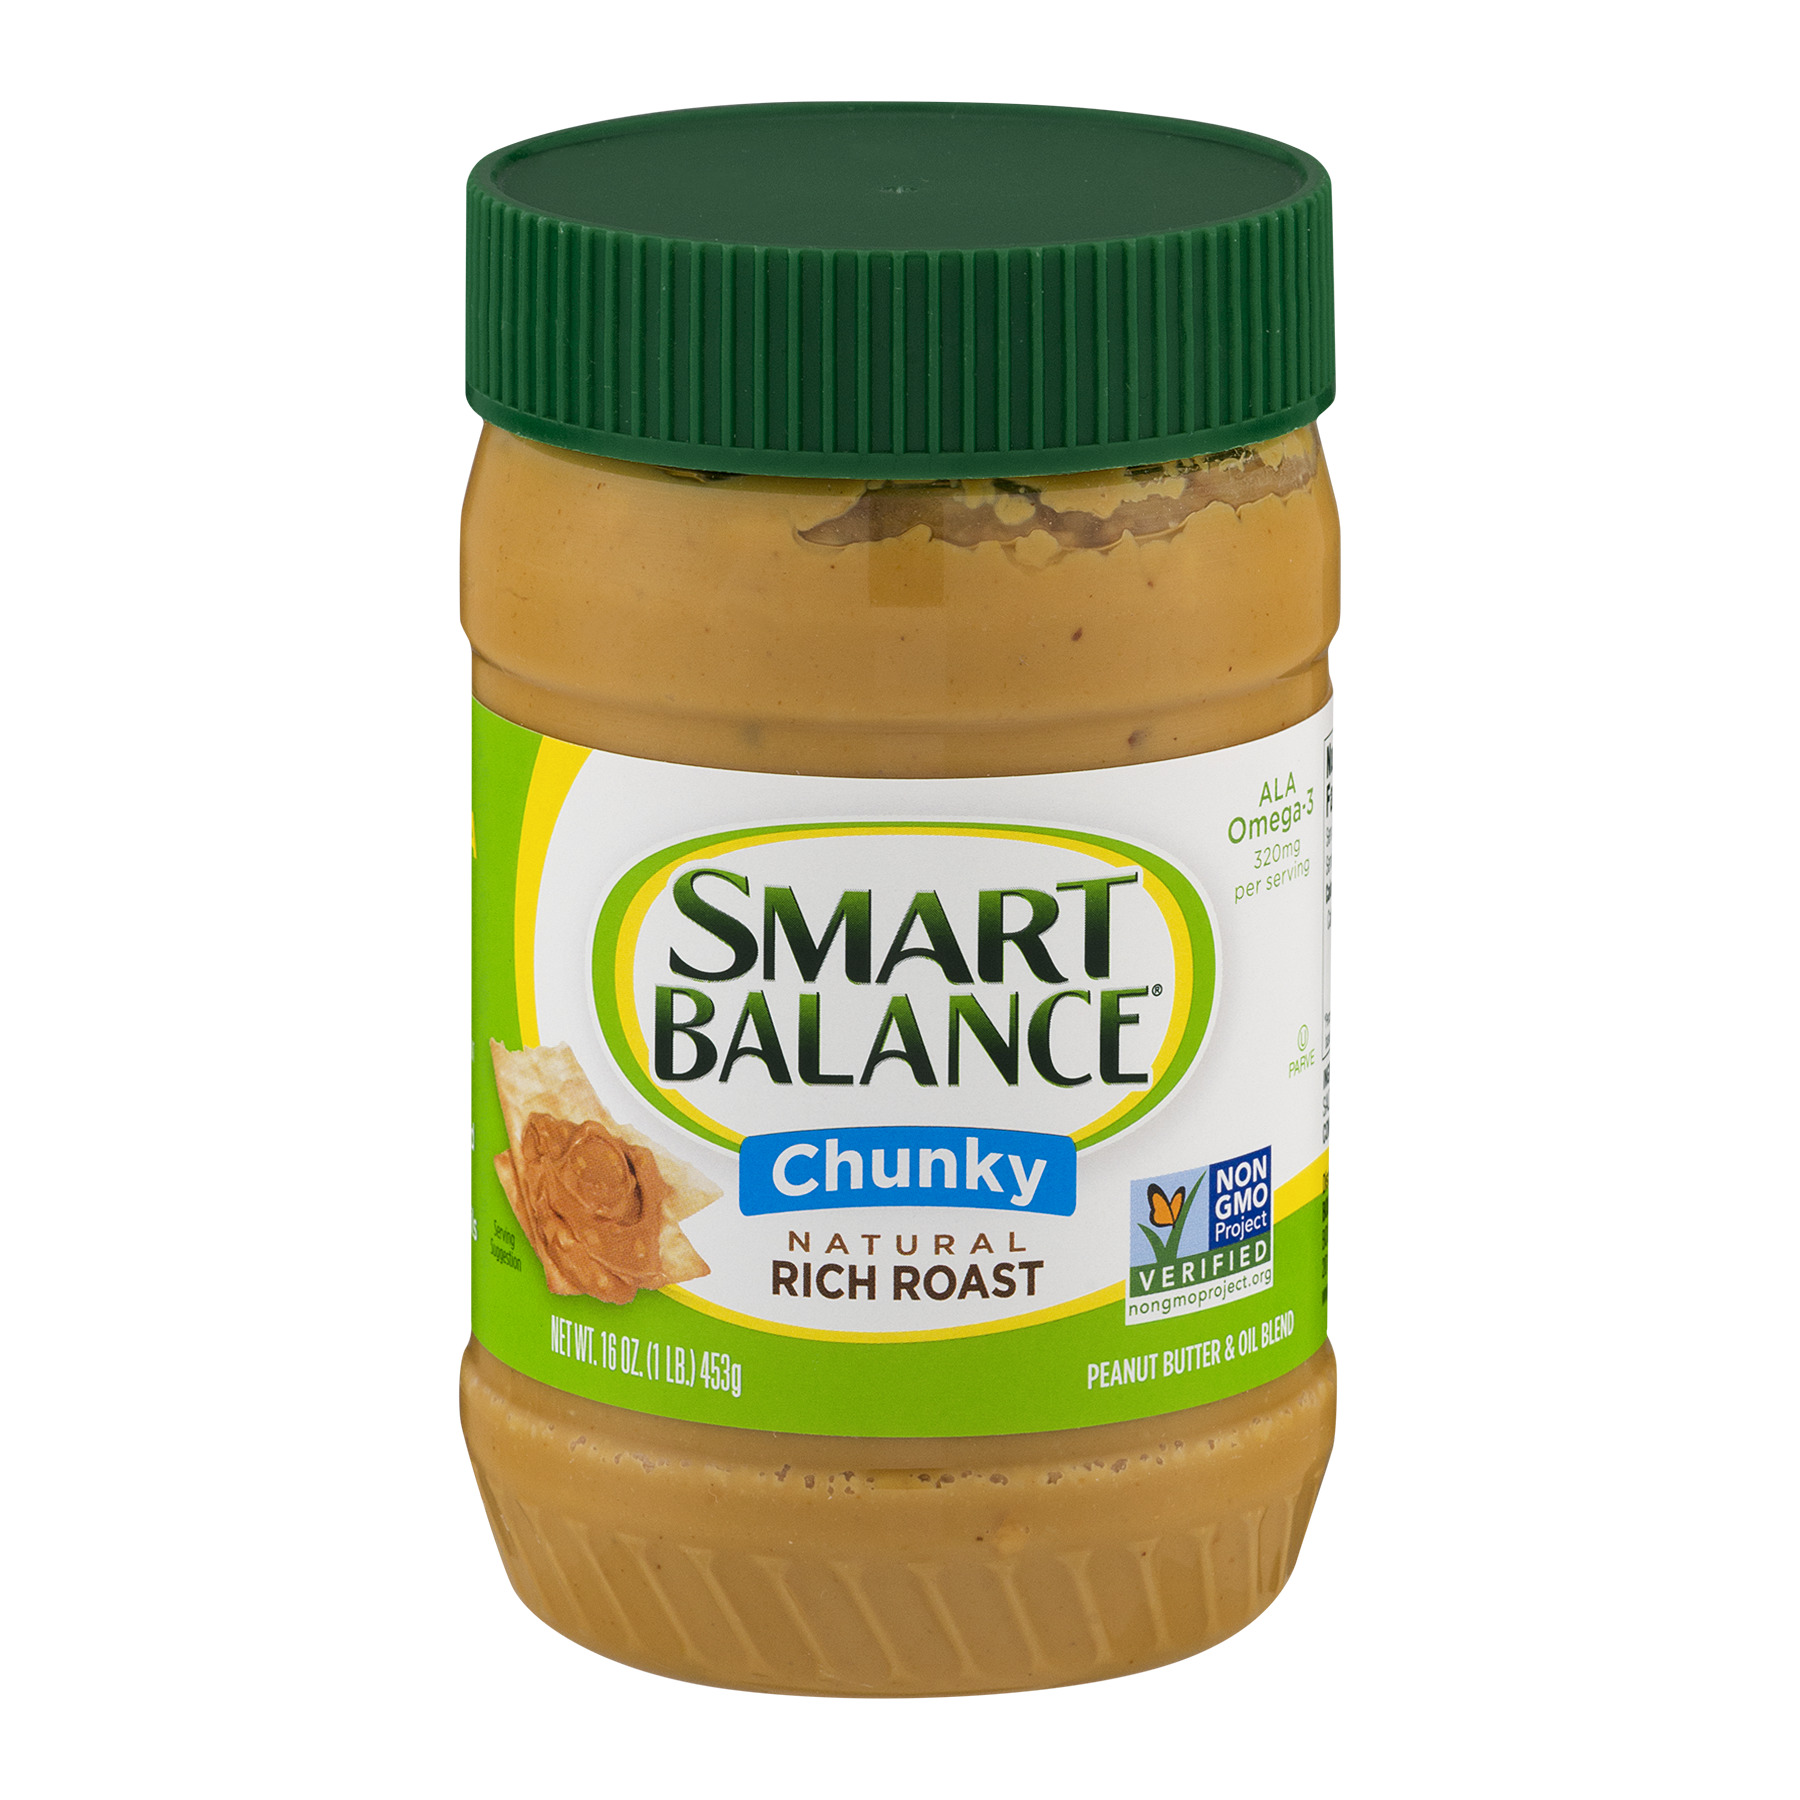 Smart Balance Natural Rich Roast Chunky Peanut Butter, 16.0 OZ